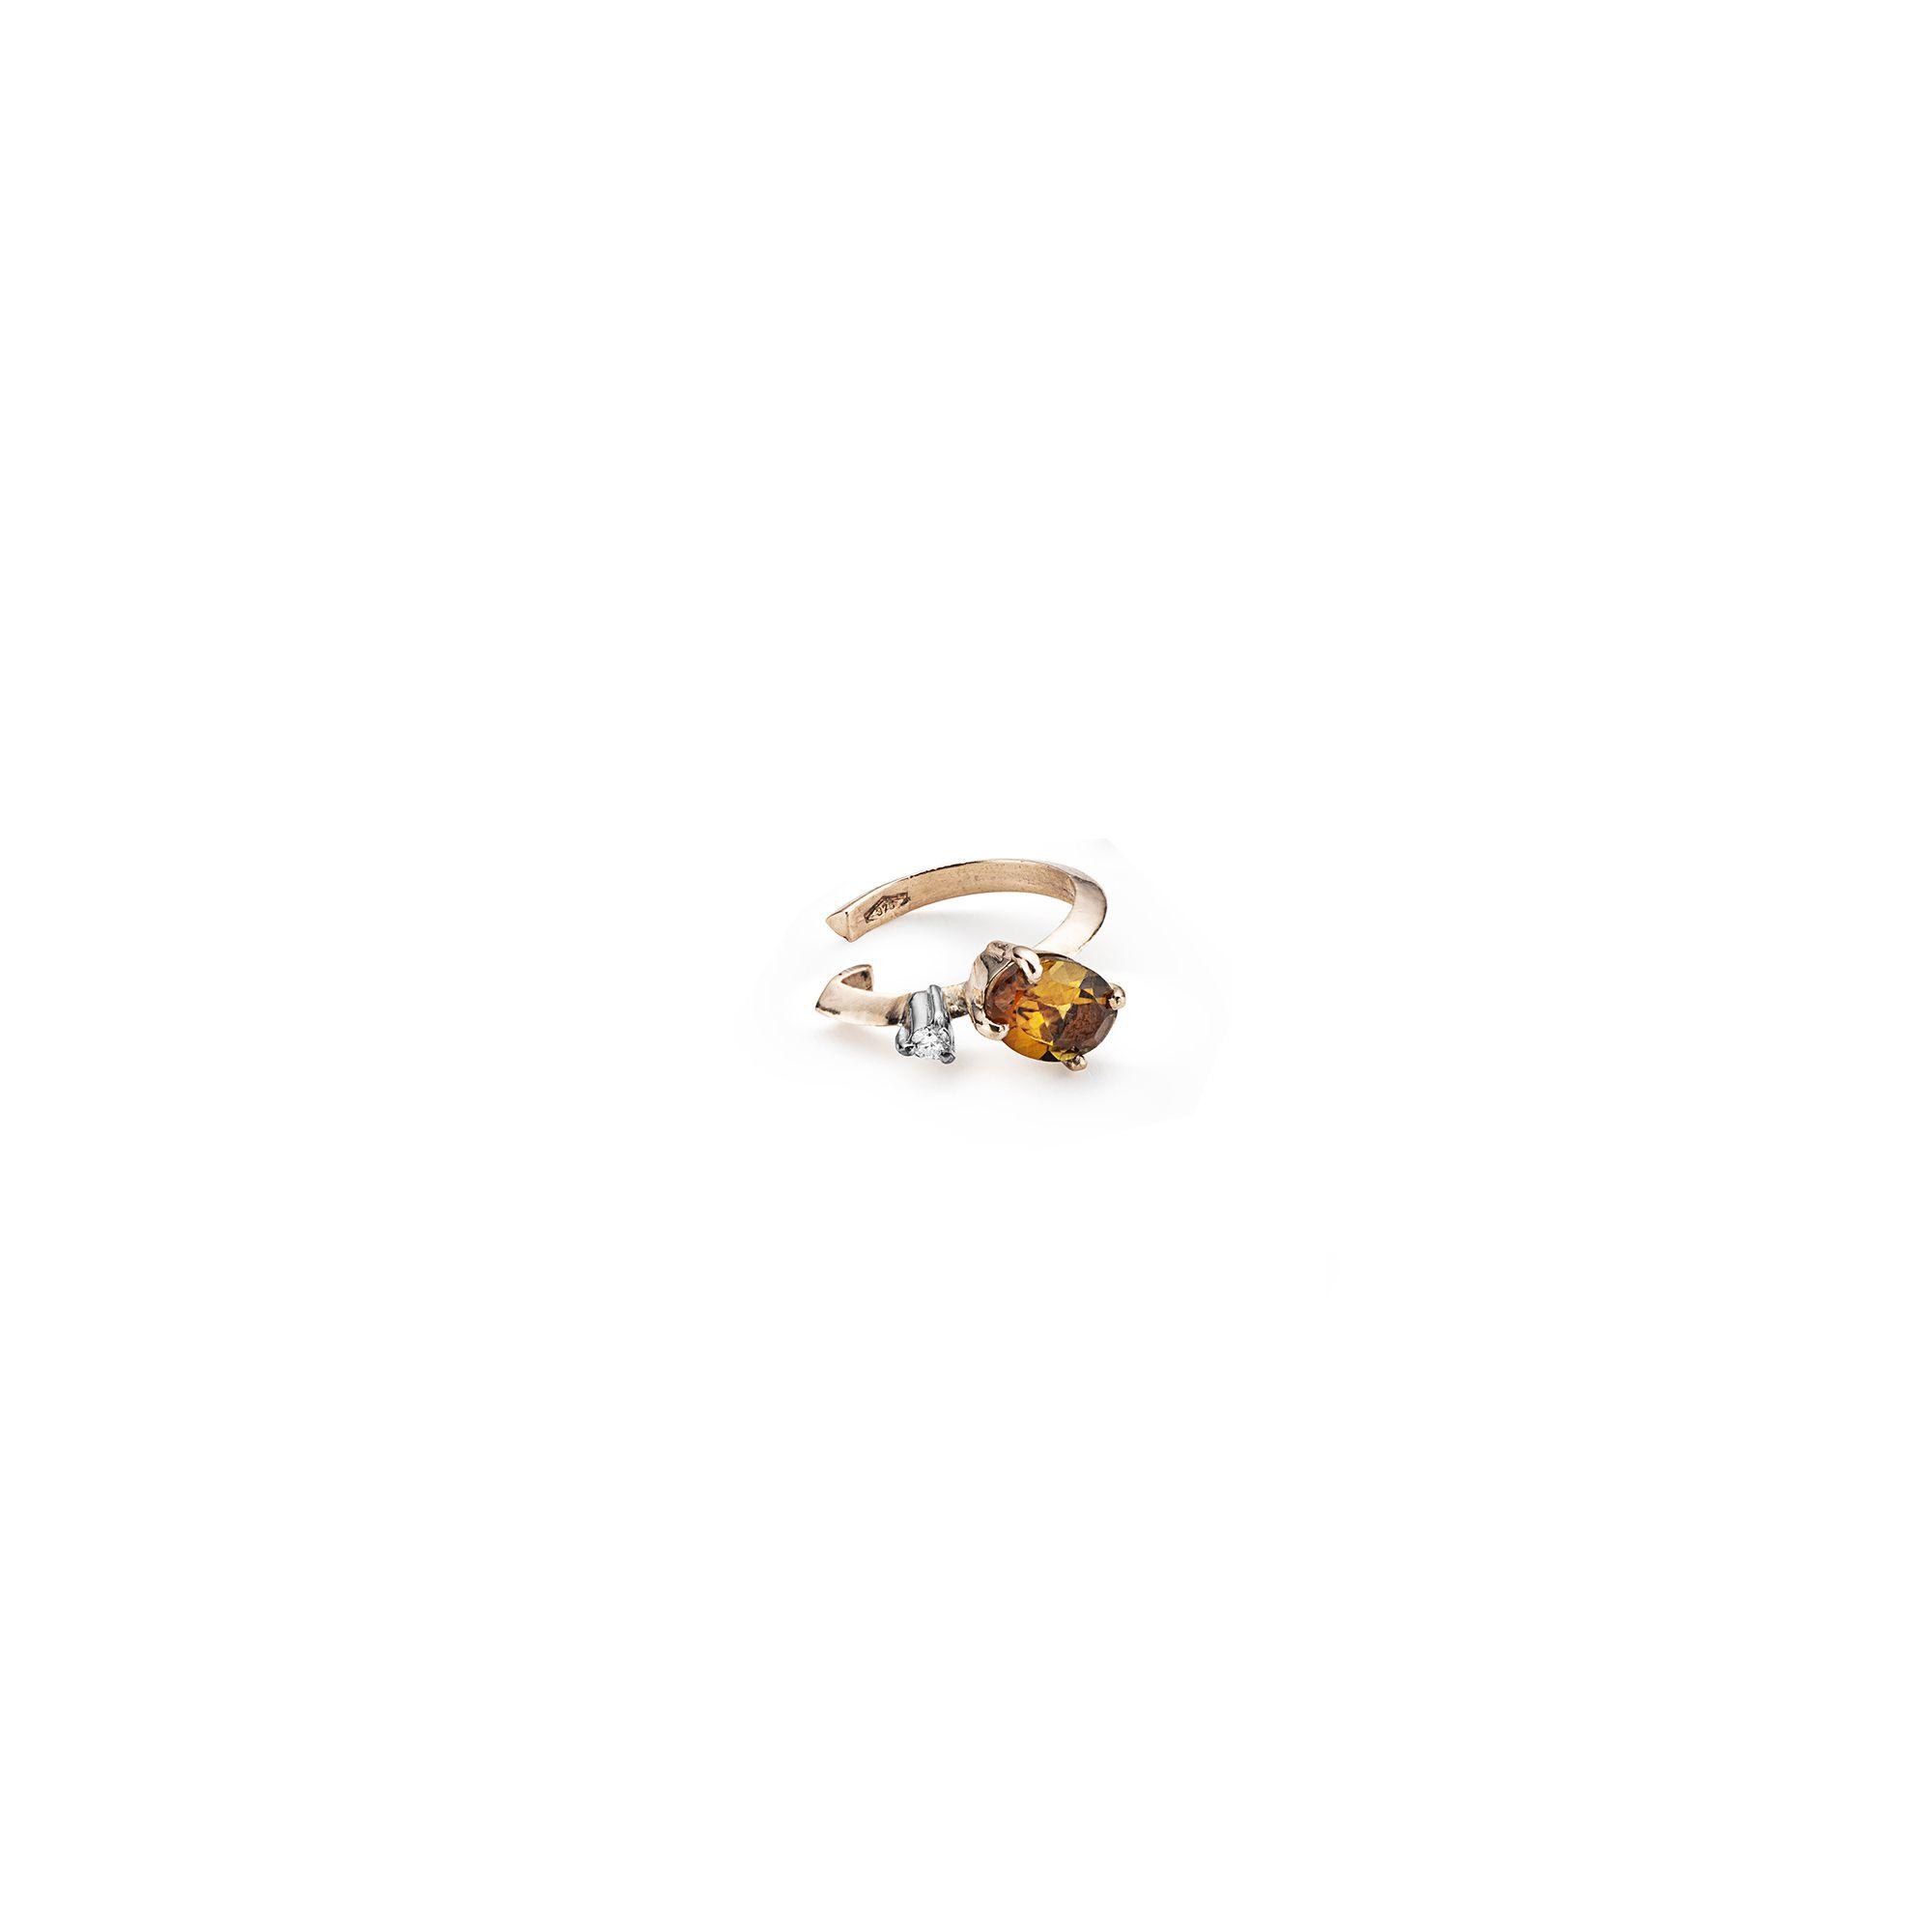 Tourmaline 'Balance' cuff earring Rose gold cartilage earring with orange tourmaline and diamonds